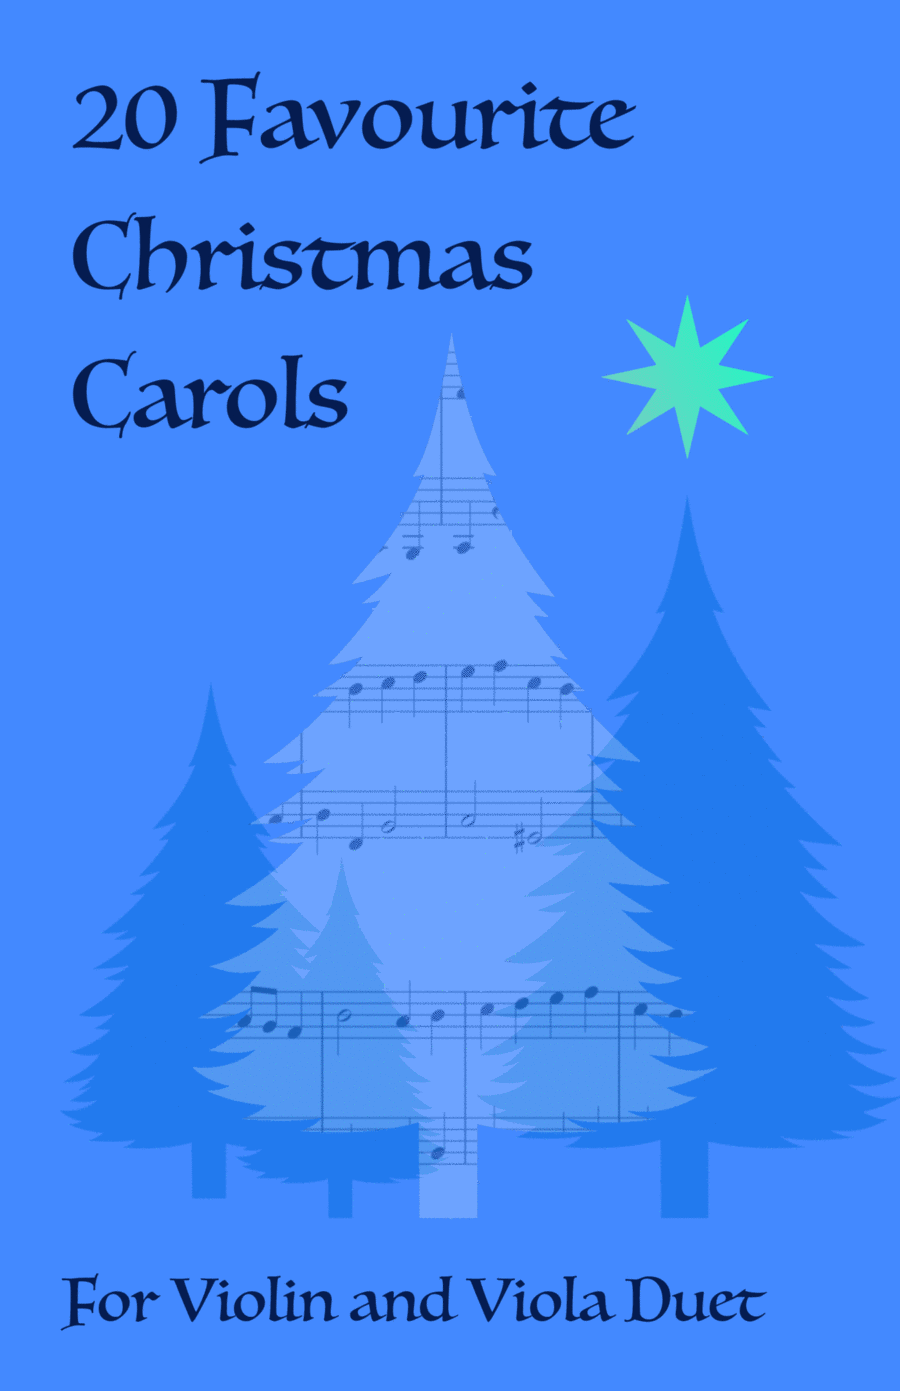 20 Favourite Christmas Carols for Violin and Viola Duet